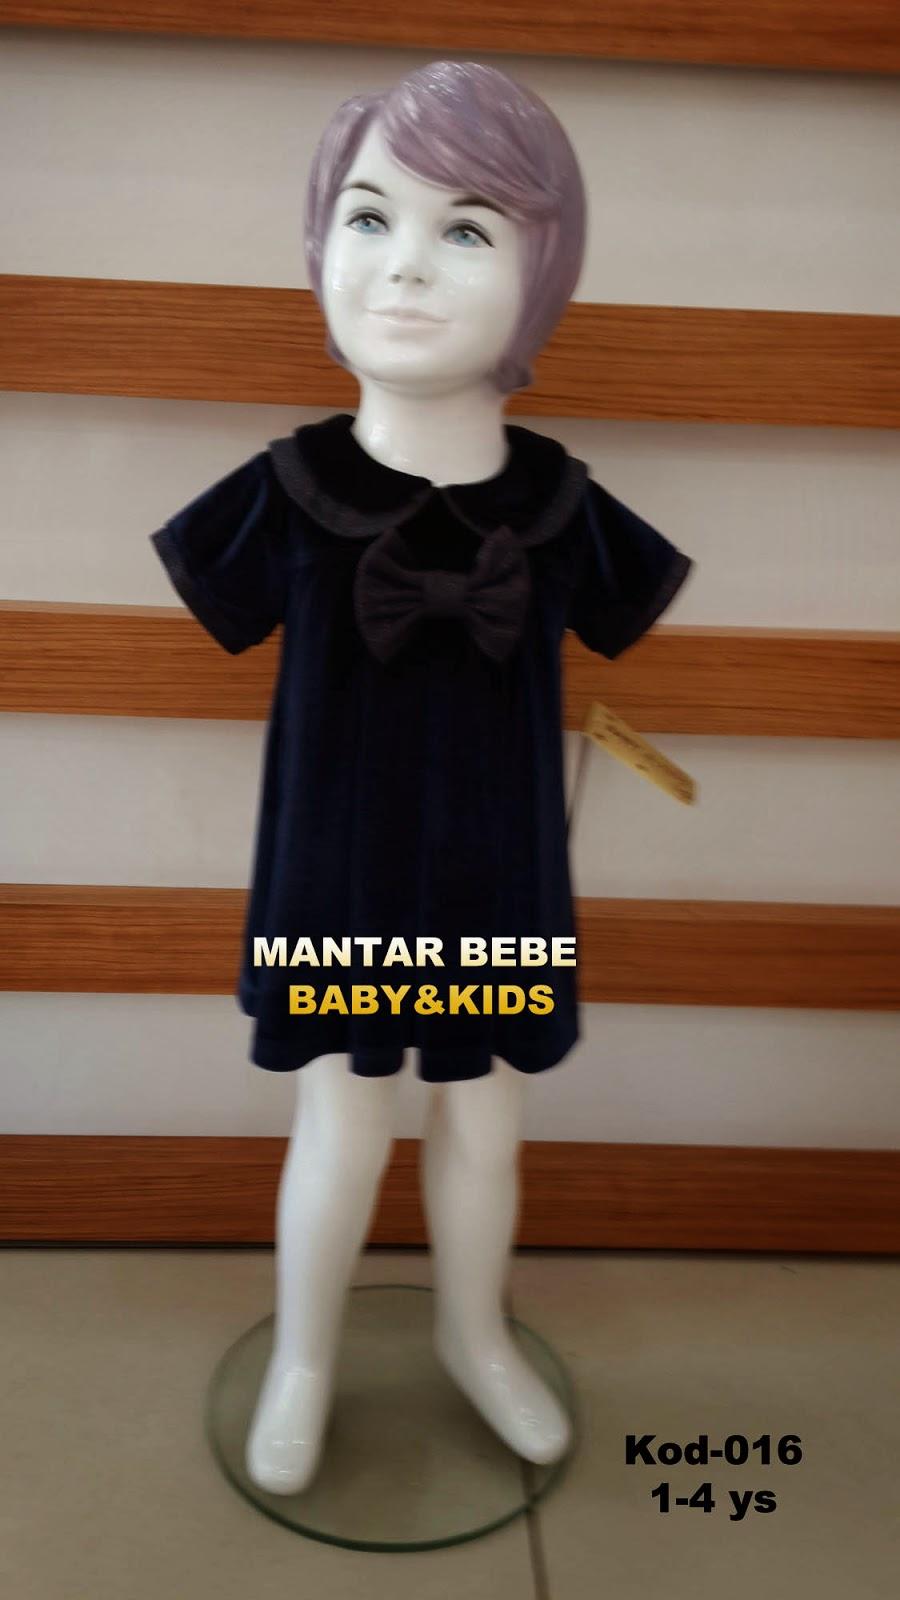 MANTAR BEBE ÇOCUK GİYİM - KOD016